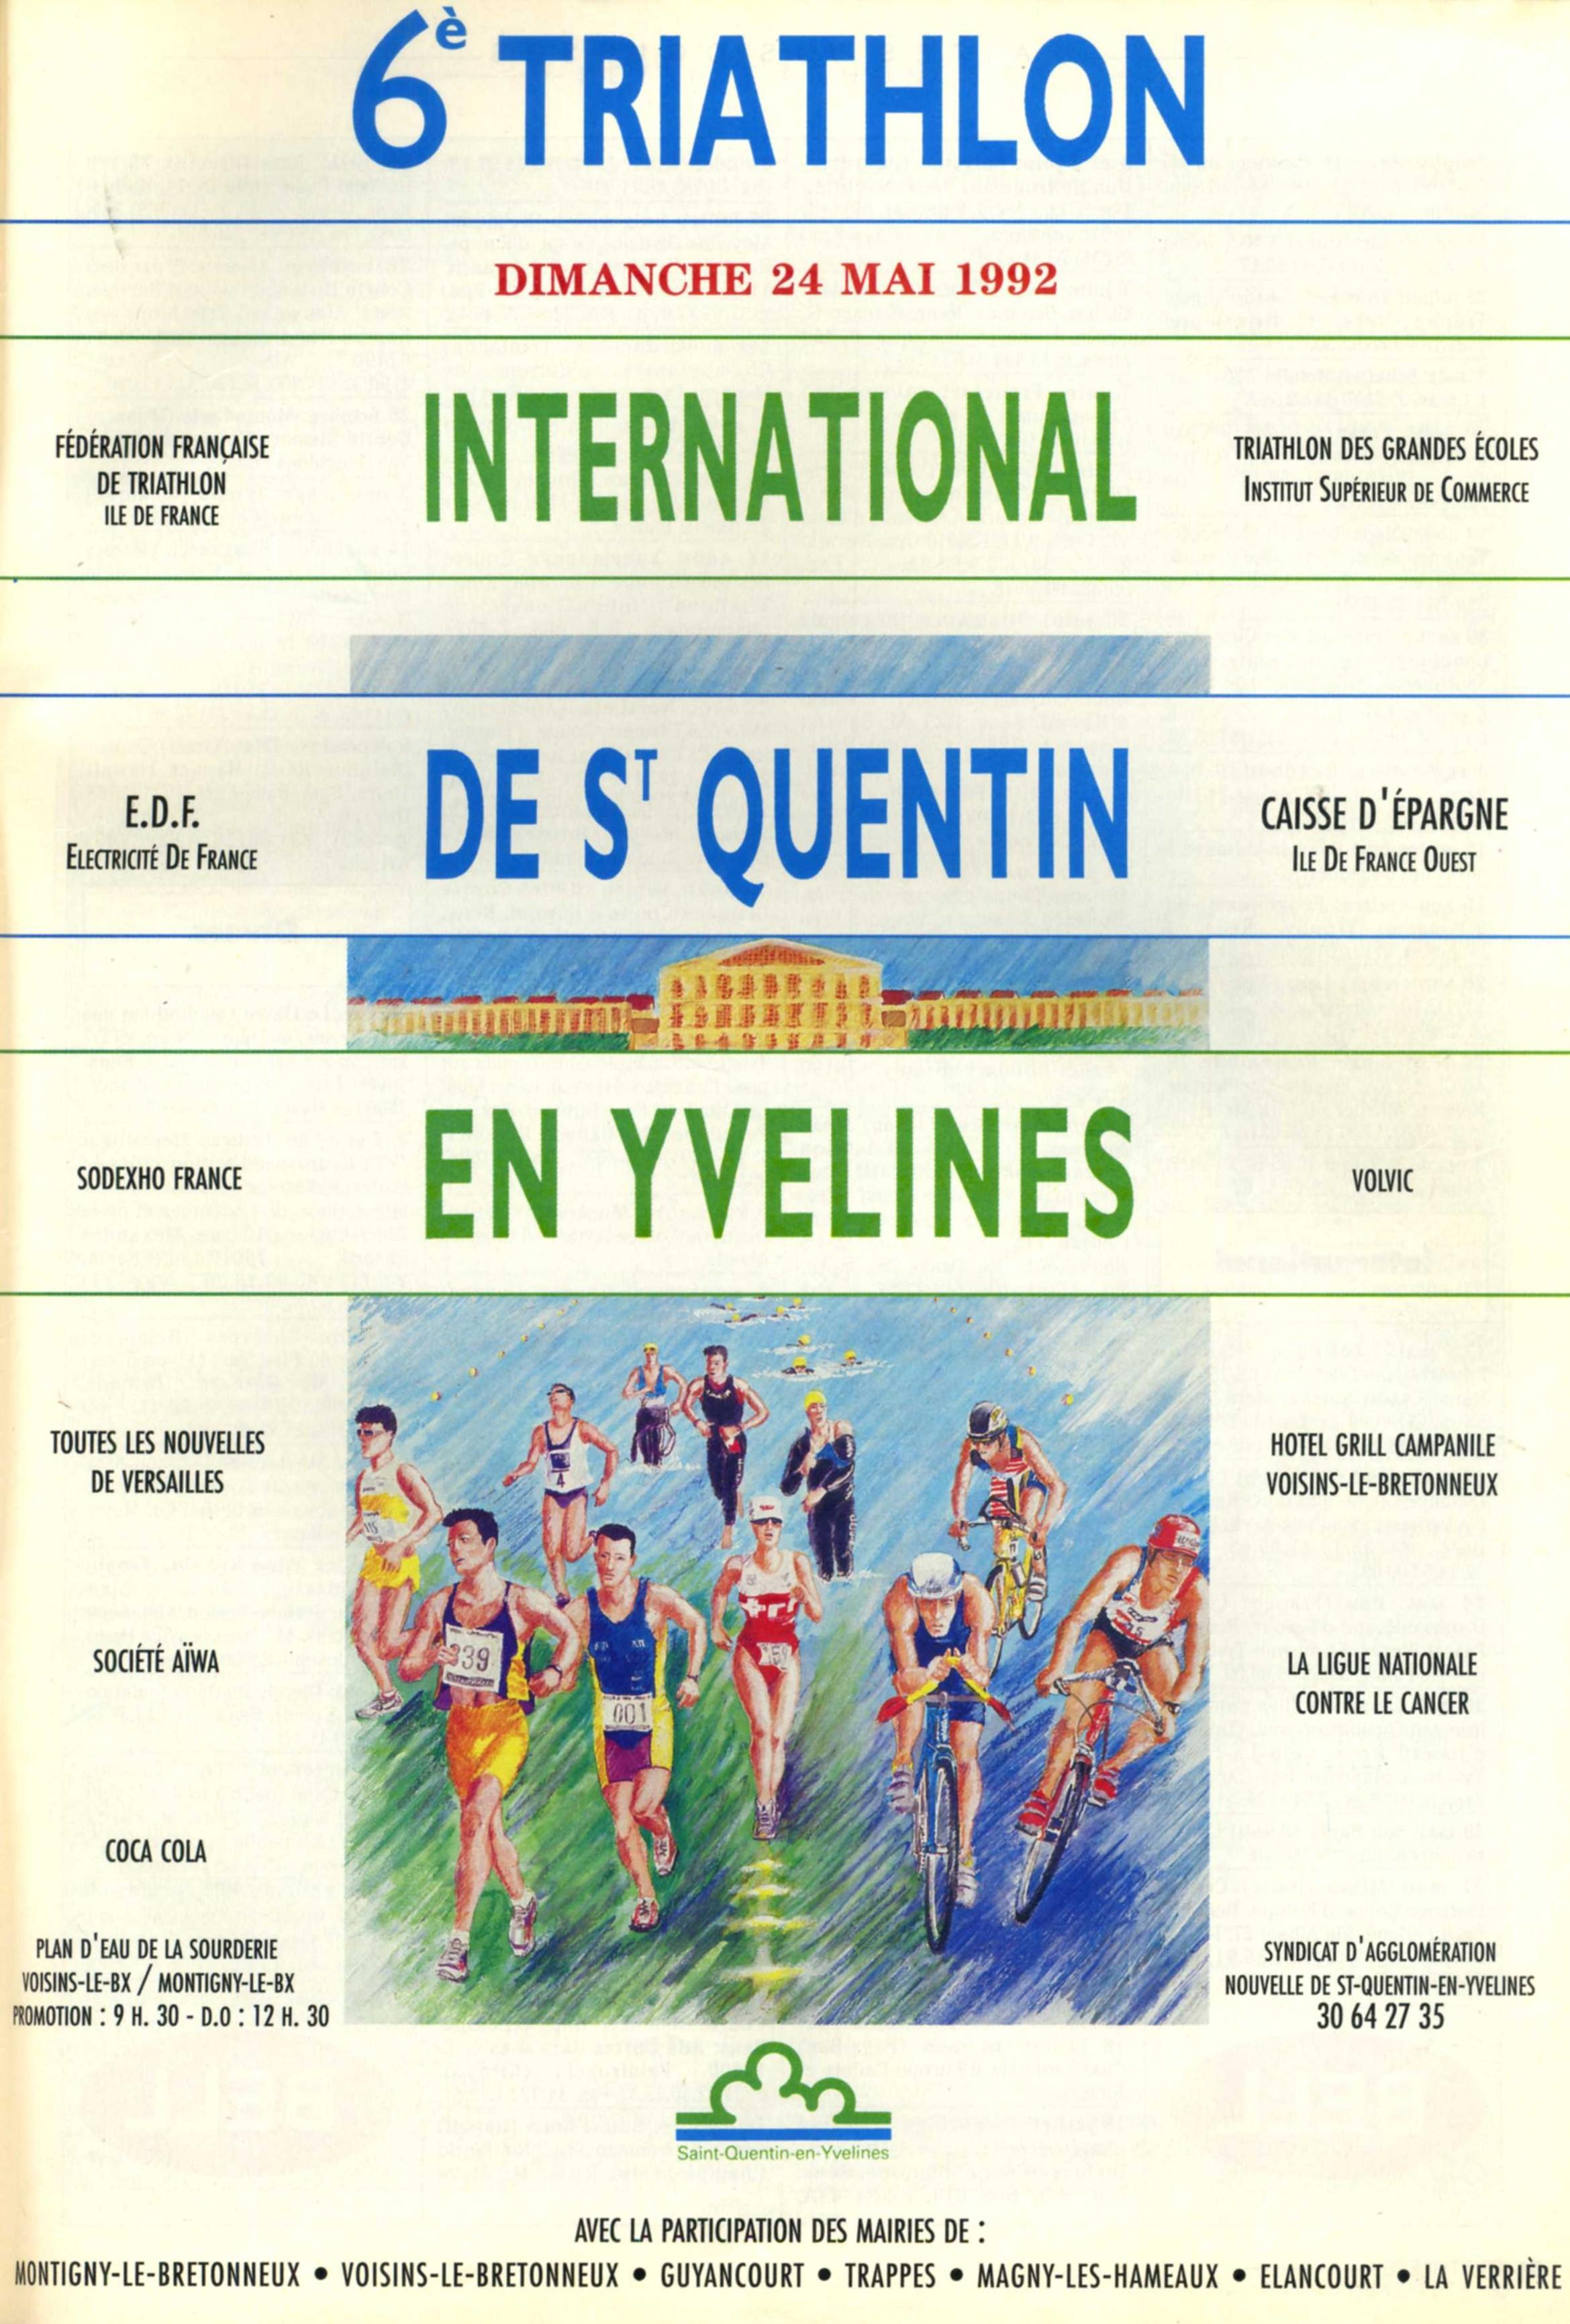 img[A]242_24-mai-1992_st-quentin-en-yvelines_pub